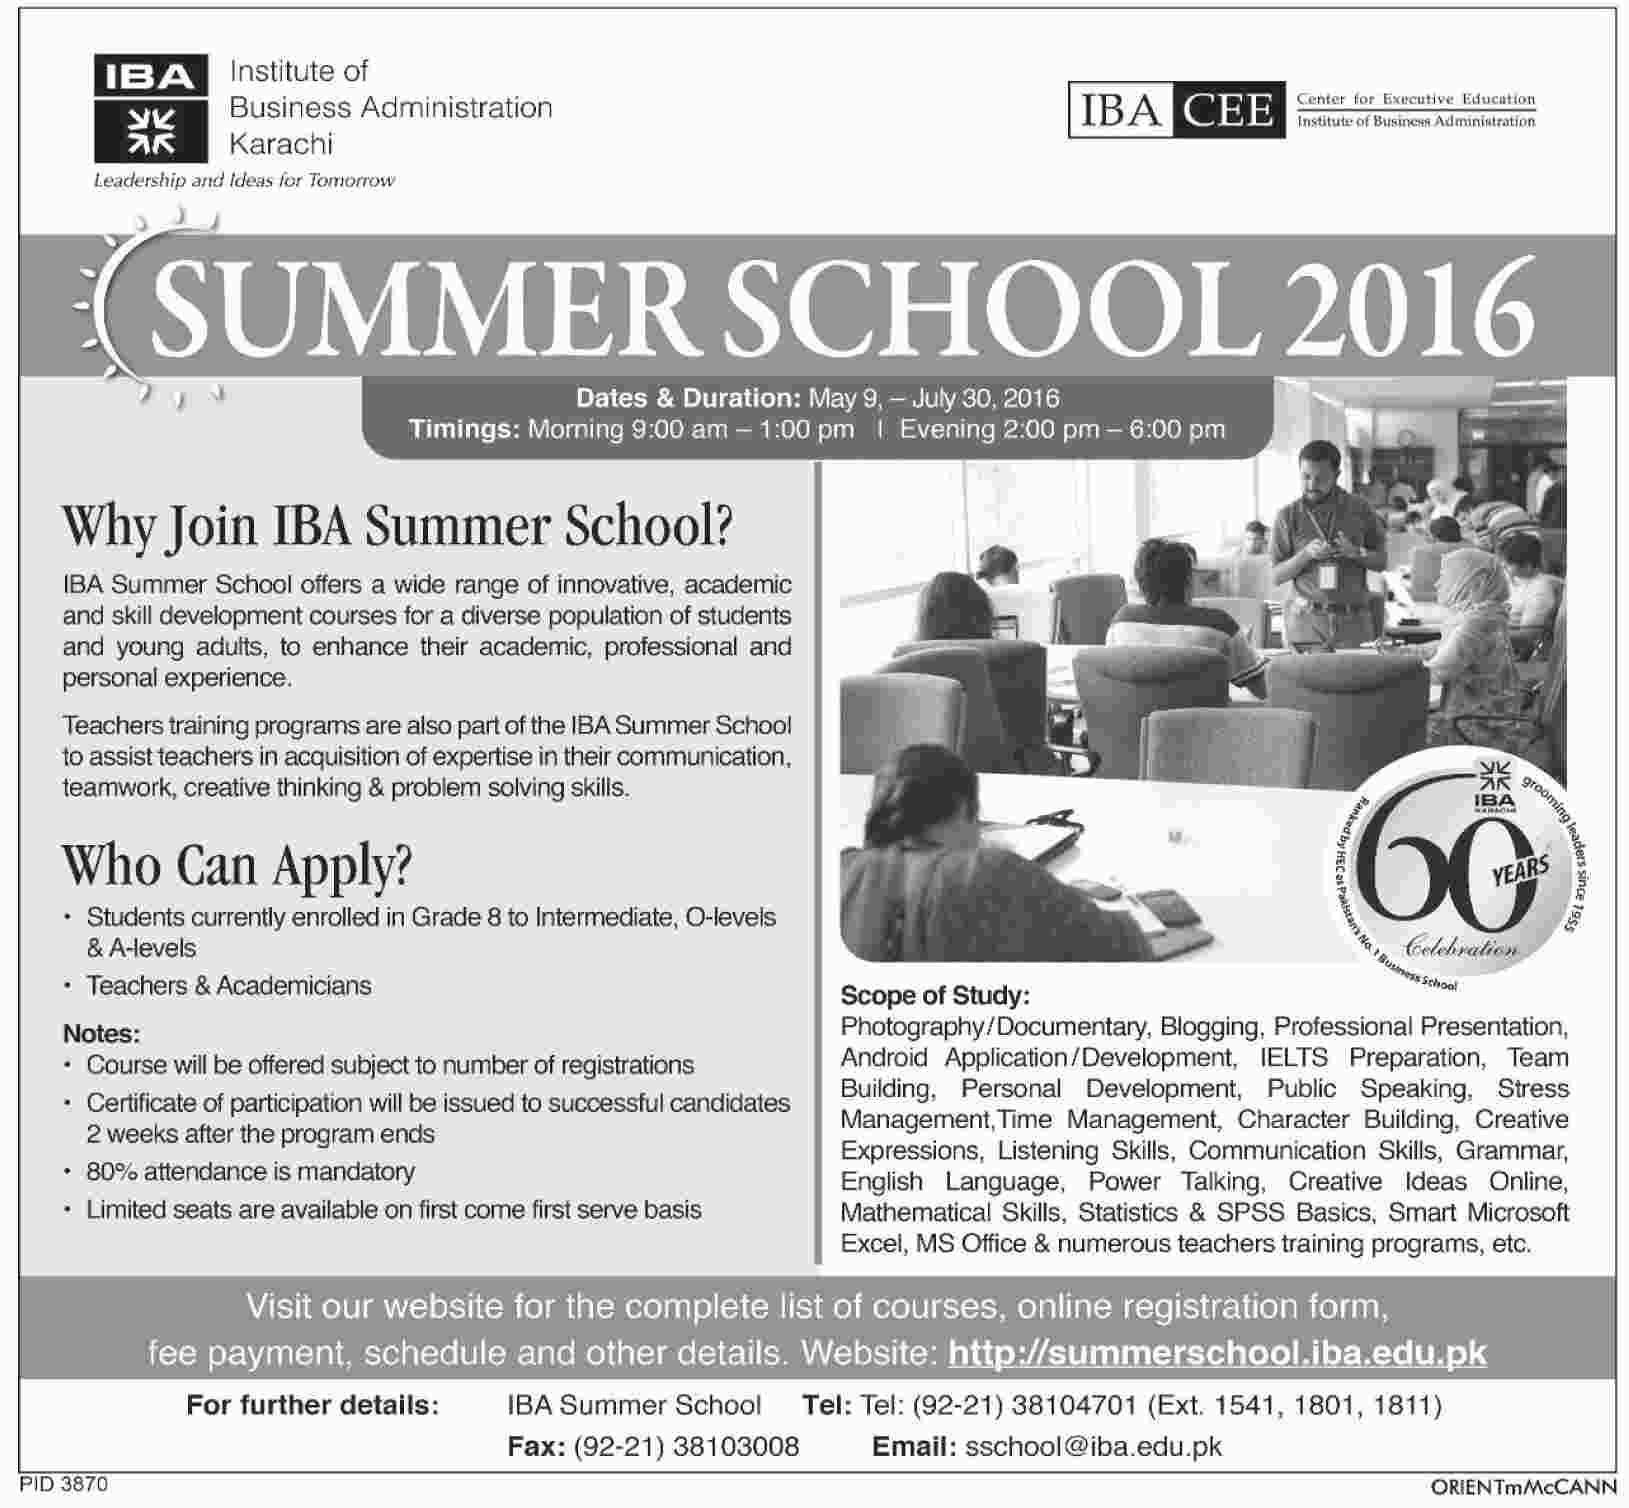 IBA Summer School 2016